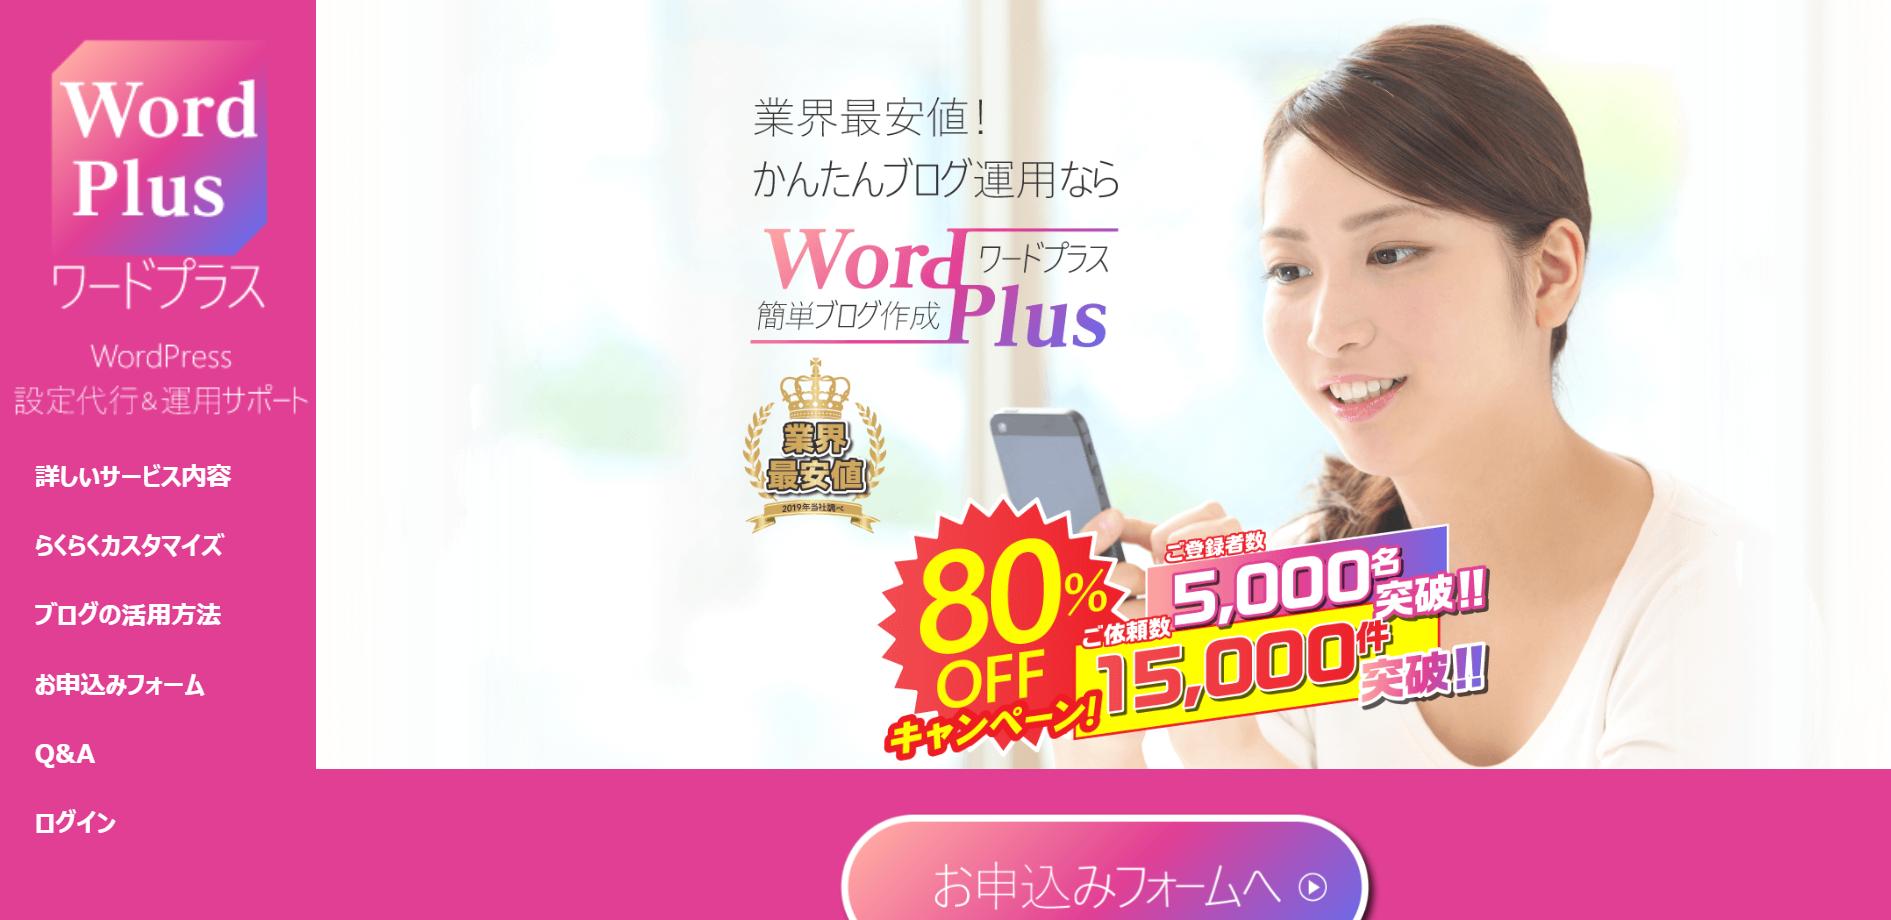 WordPlus(ワードプラス)